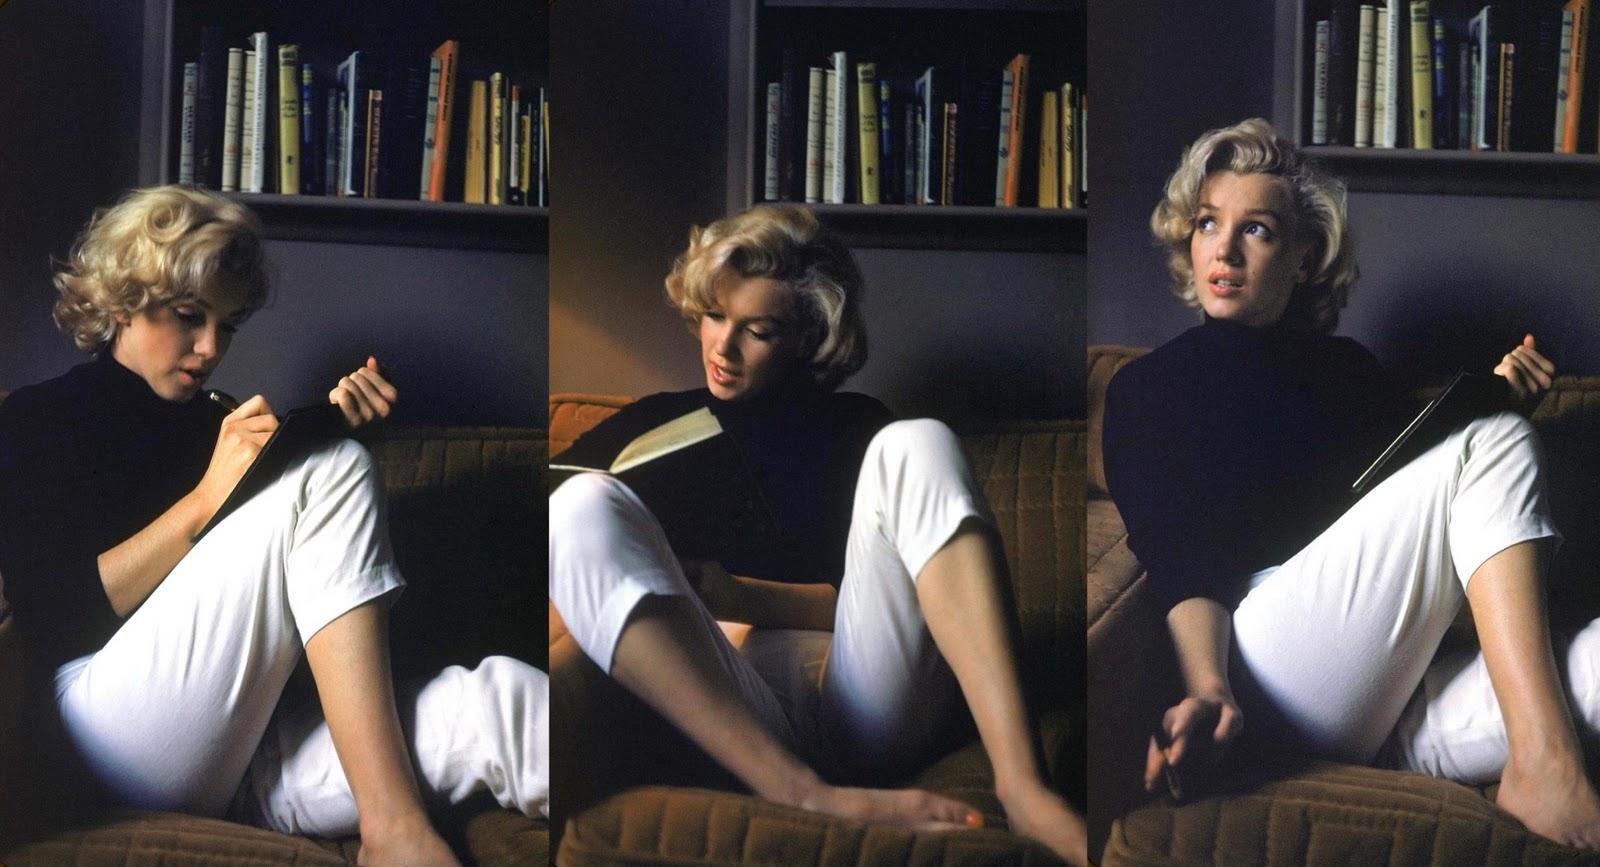 http://2.bp.blogspot.com/-YwJdNtHQfbk/T7-g_SZf3qI/AAAAAAAAI9E/oOyRfYZ6MZg/s1600/Marilyn+Monroe_reading+and+writing.jpg